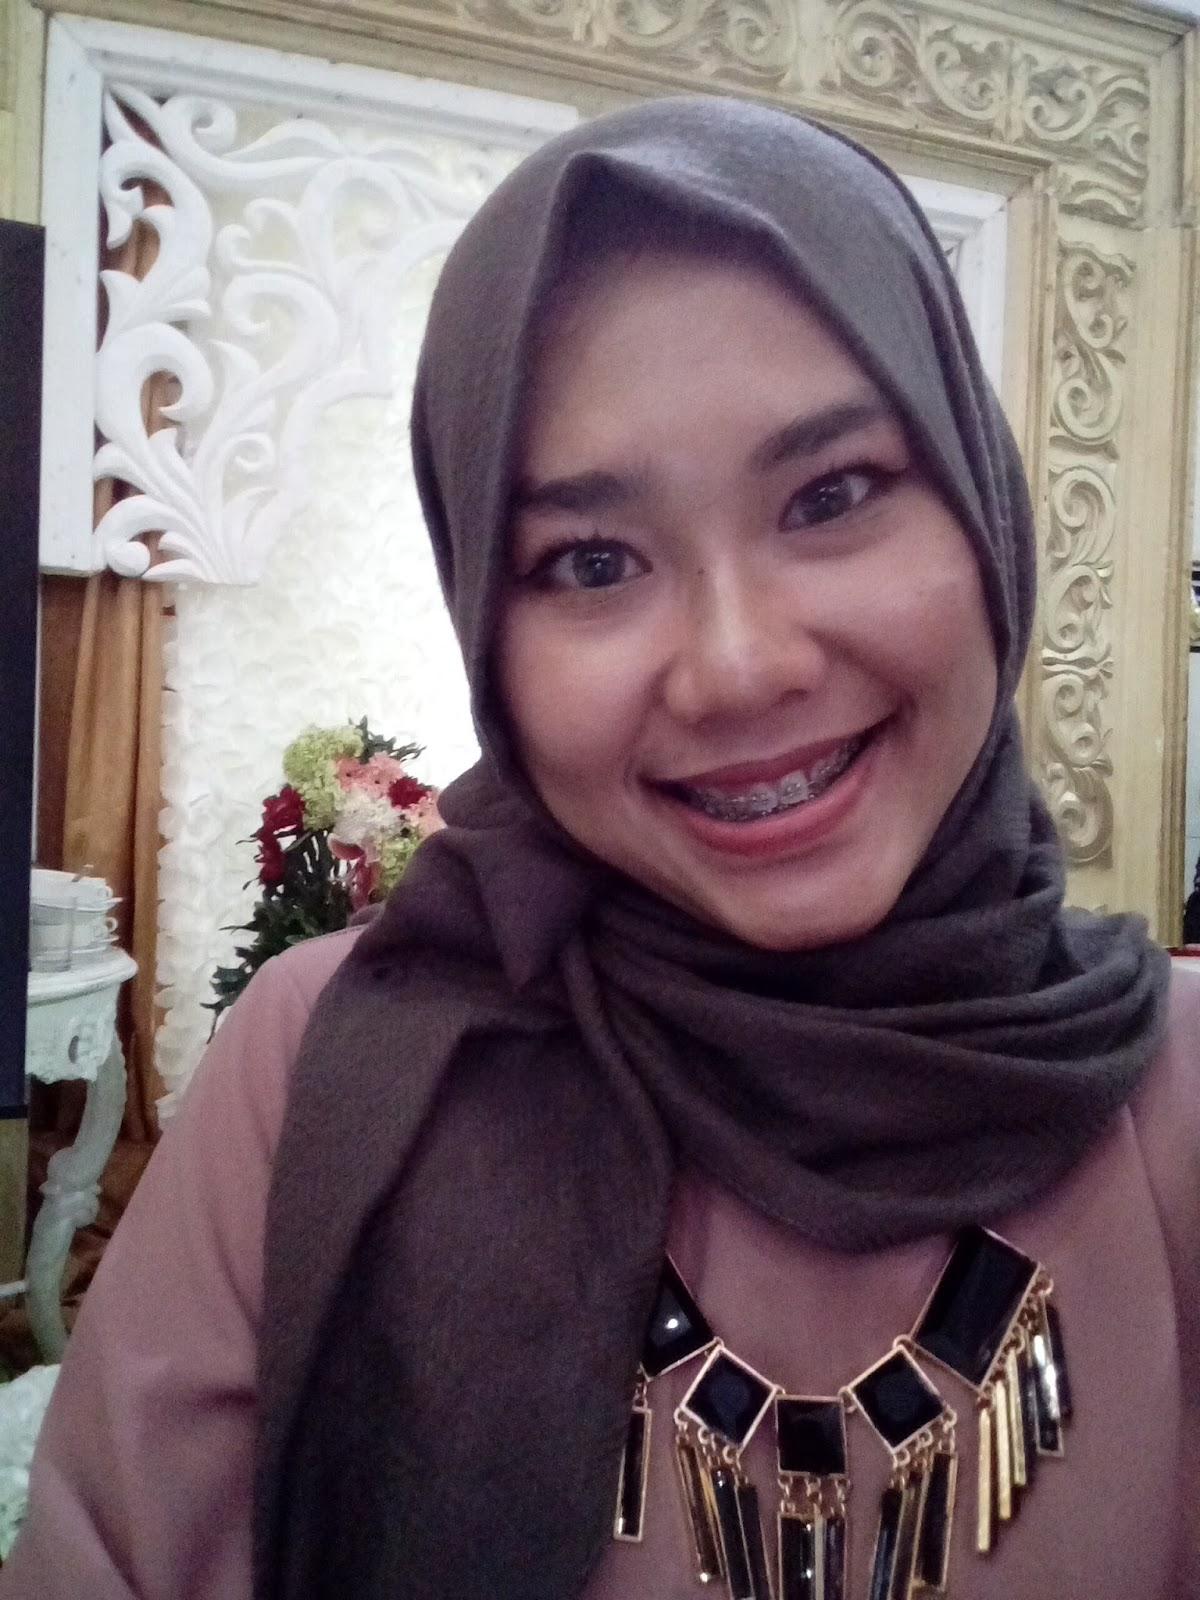 Warna Jilbab Yang Itu Itu Aja